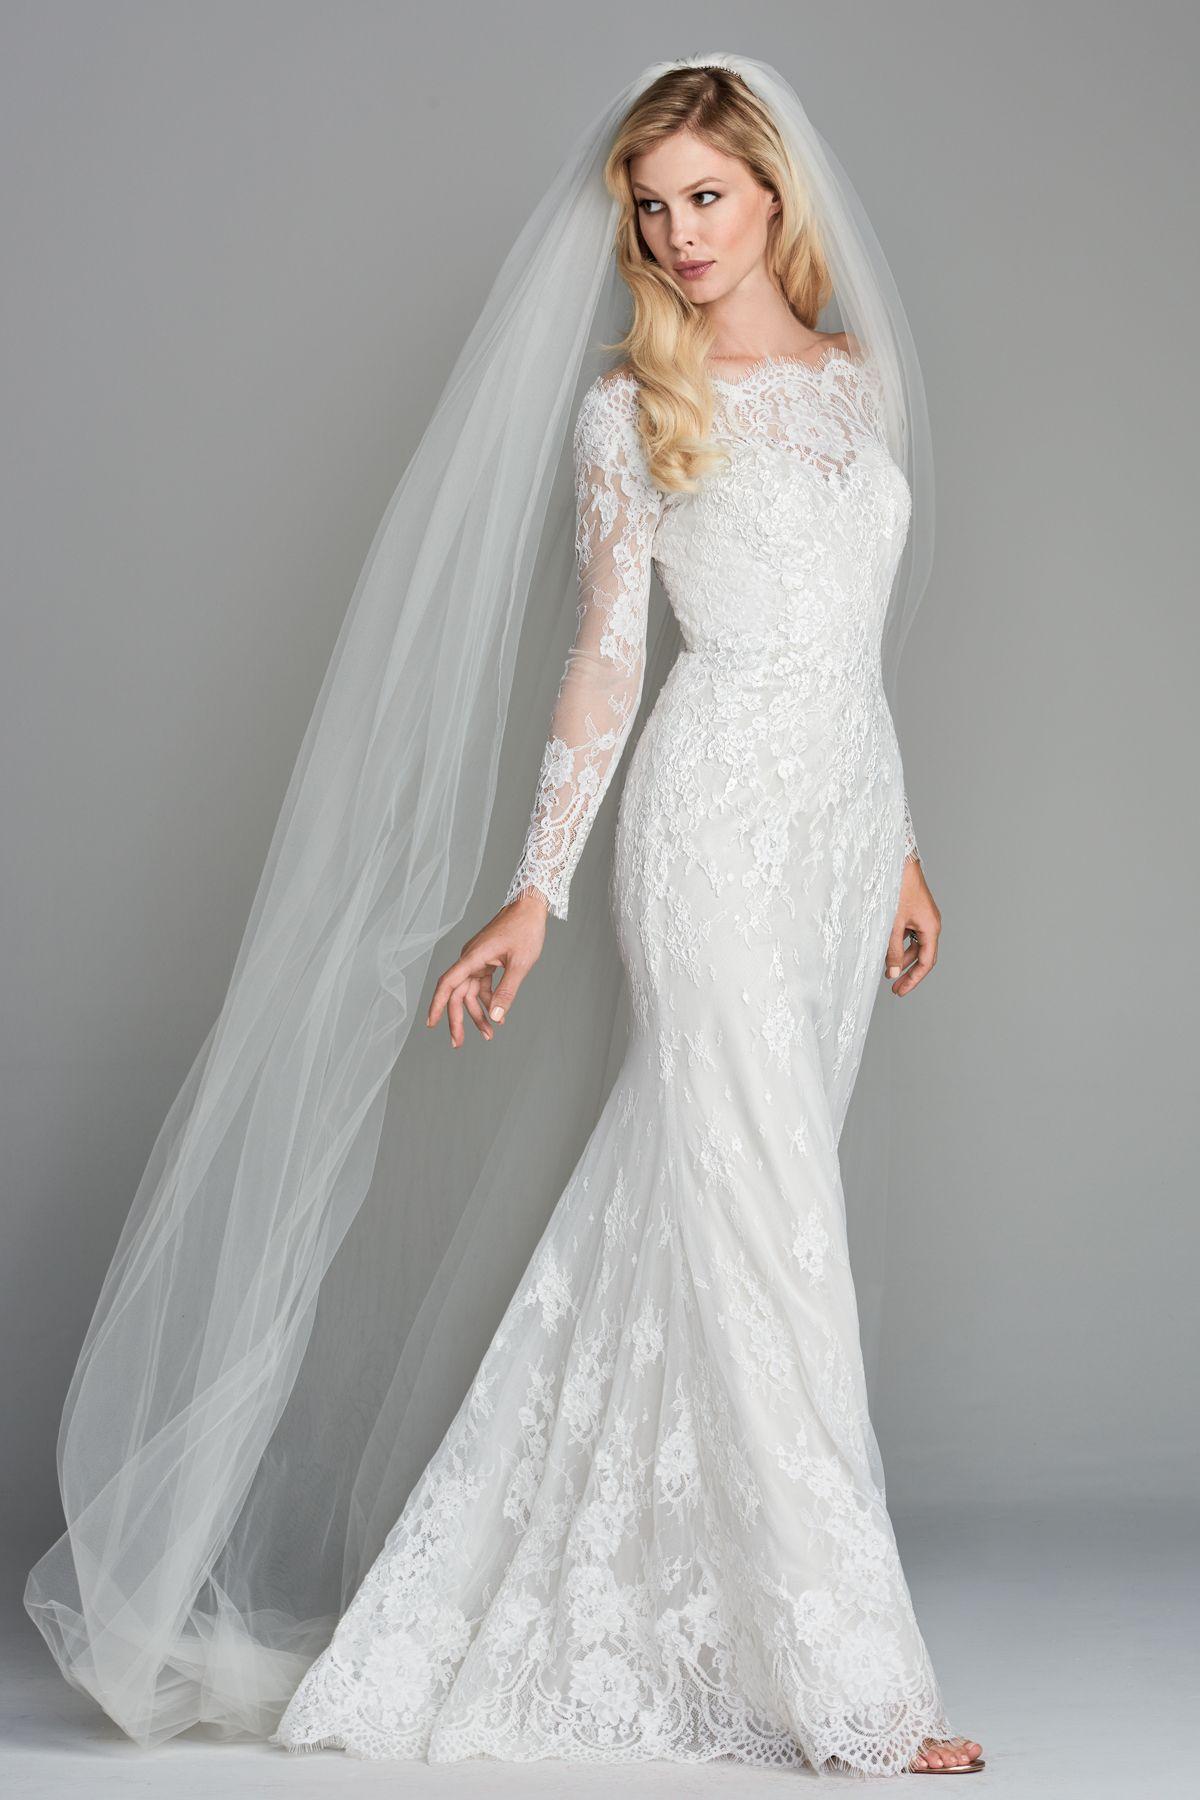 Watters 2018 Kensington Gown. Stunning full lace, long sleeve sheath ...